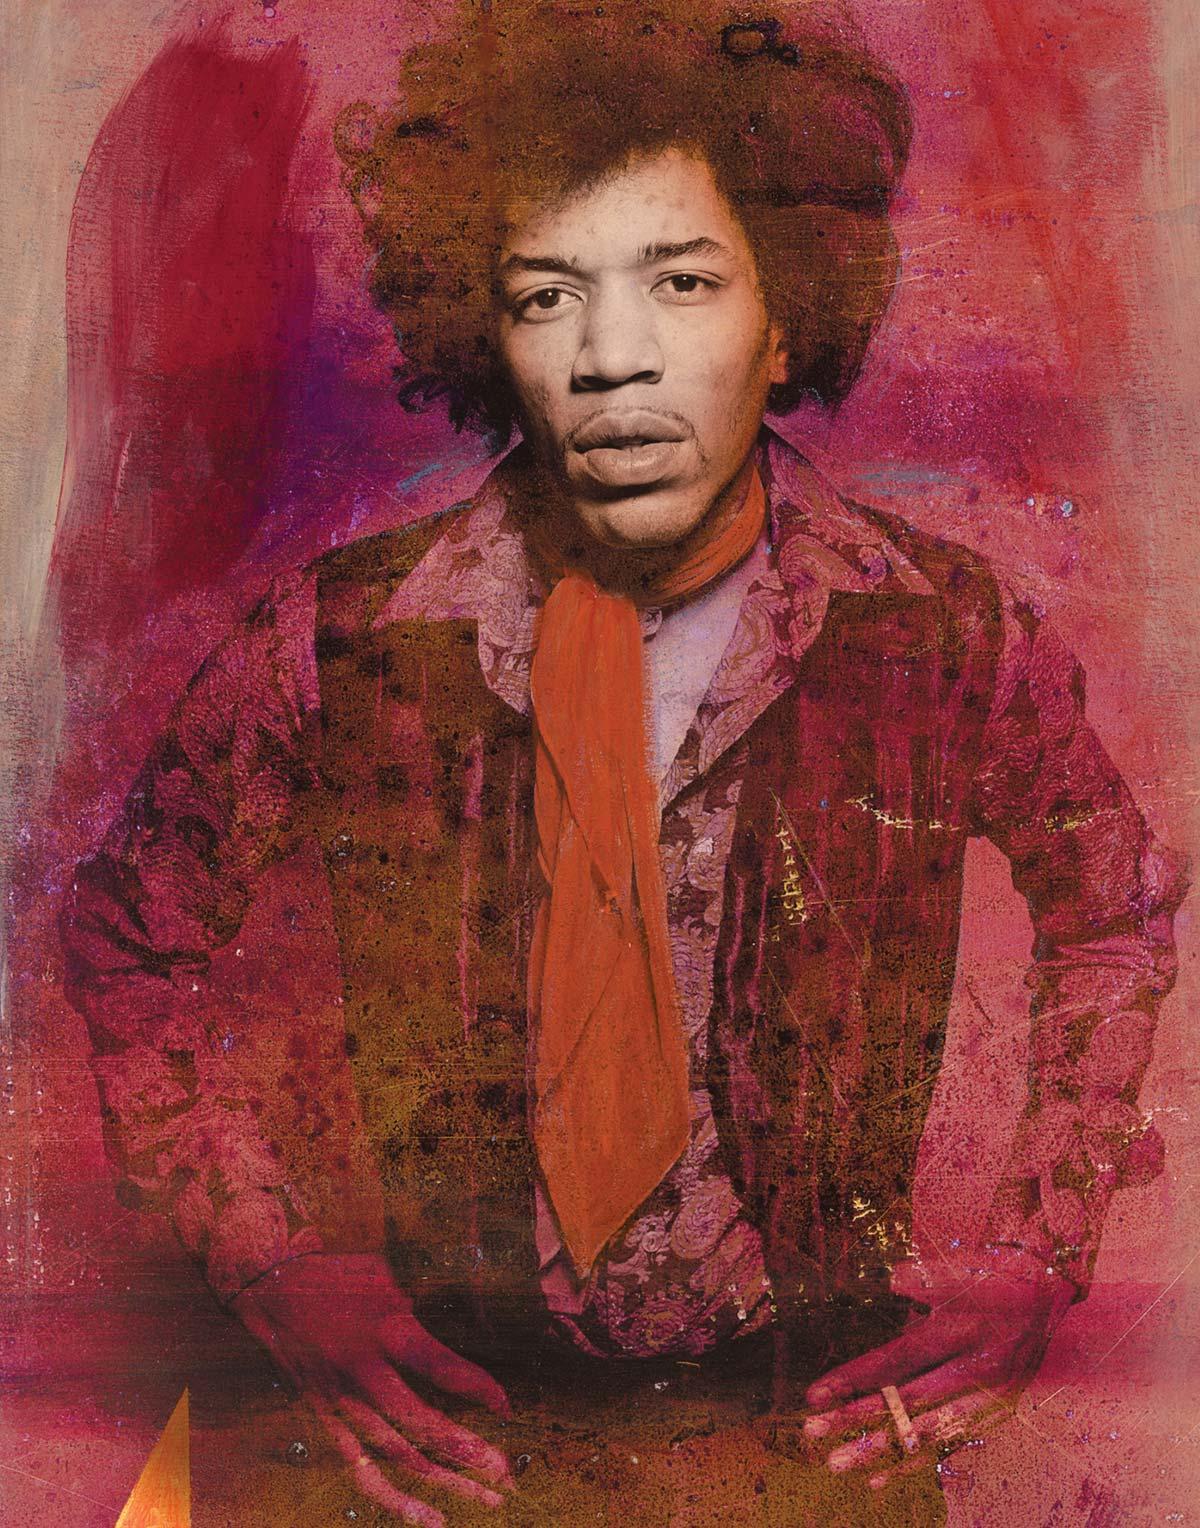 Madder Haze 2017 featuring Jimi Hendrix